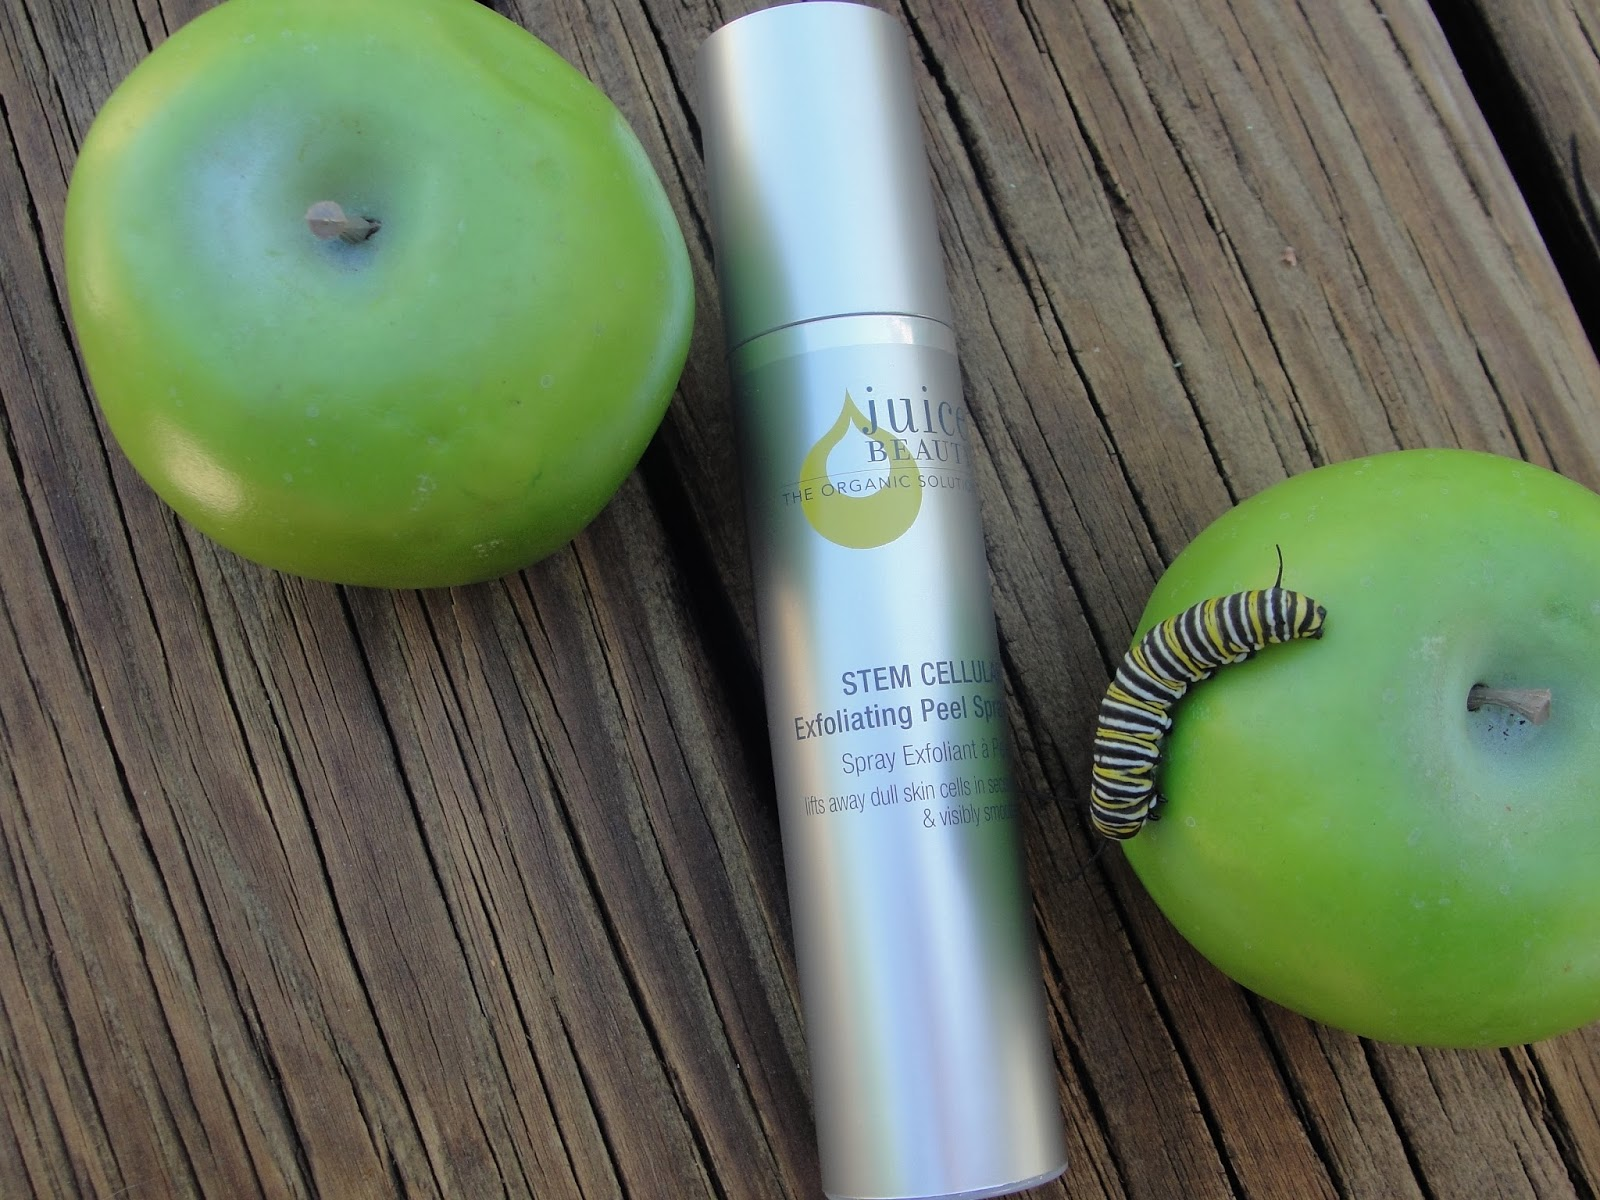 Stem Cellular Exfoliating Peel Spray by Juice Beauty #14